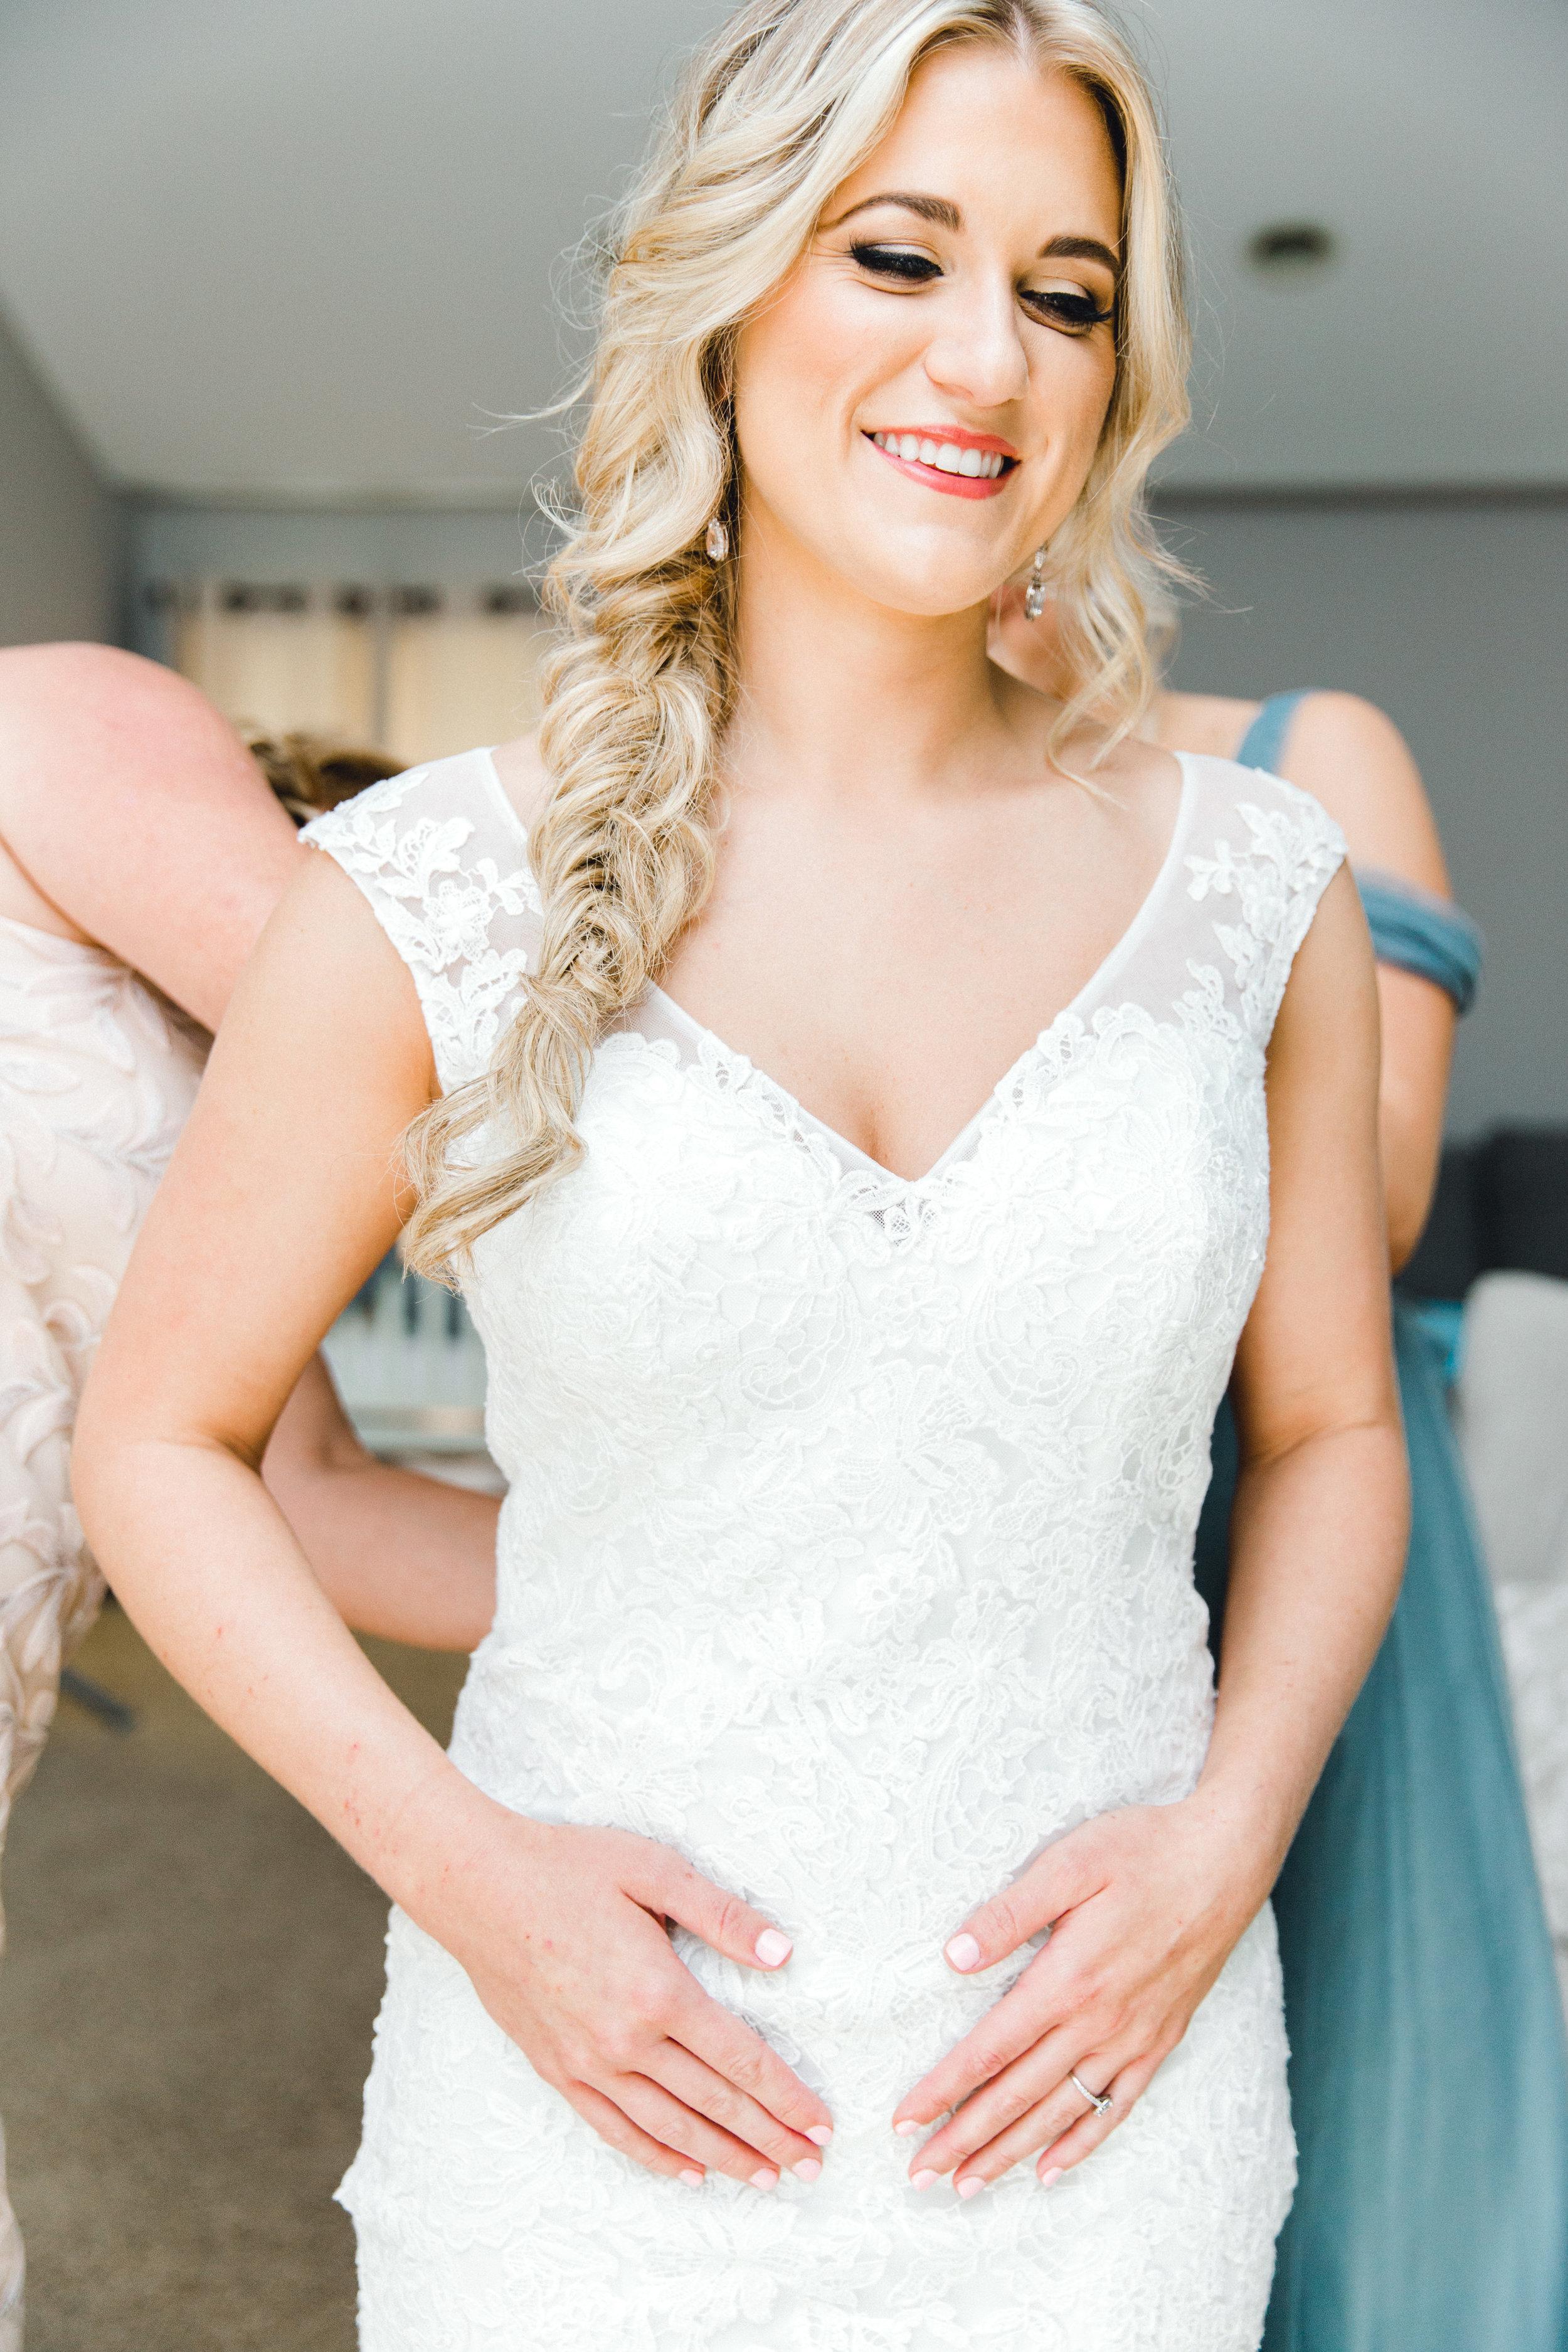 Paige-Mercer-Photography-Florida-Wedding-Photographer-Alyssa&Drew-26.jpg